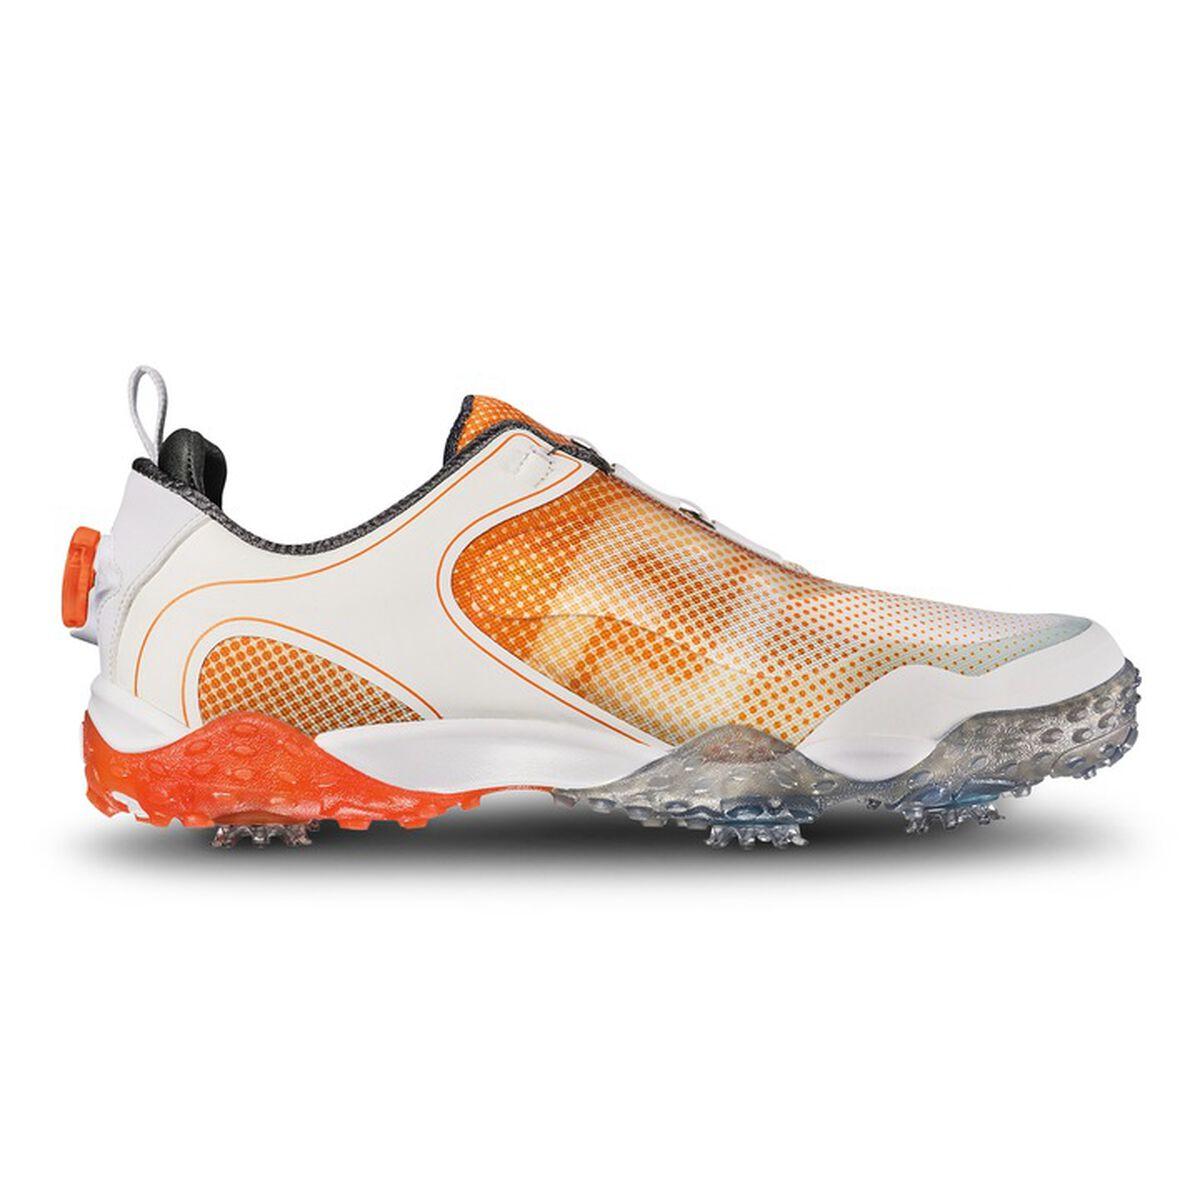 0d57a82c45642c FootJoy Freestyle BOA Men s Golf Shoe - White Orange